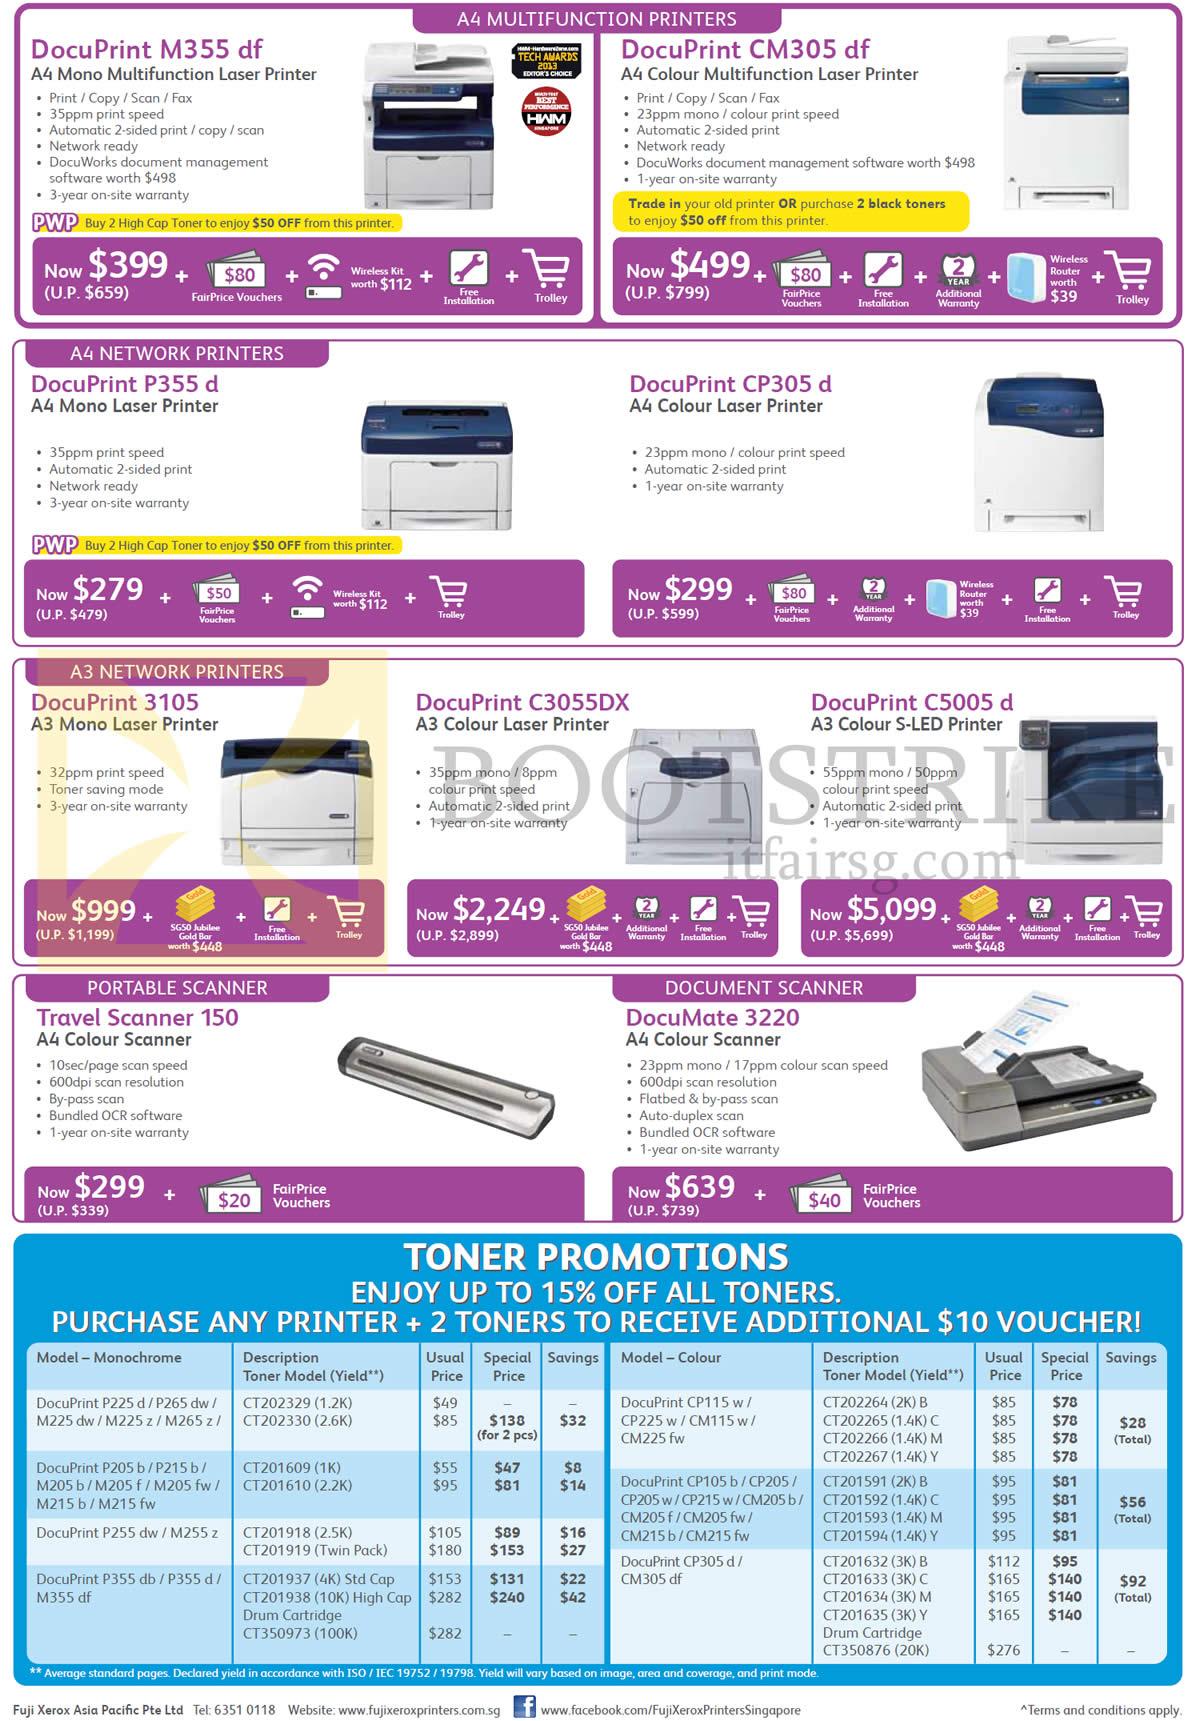 Fuji Xerox Printers, Scanner, M355df, CM305df, P355d, CP305d, 3105